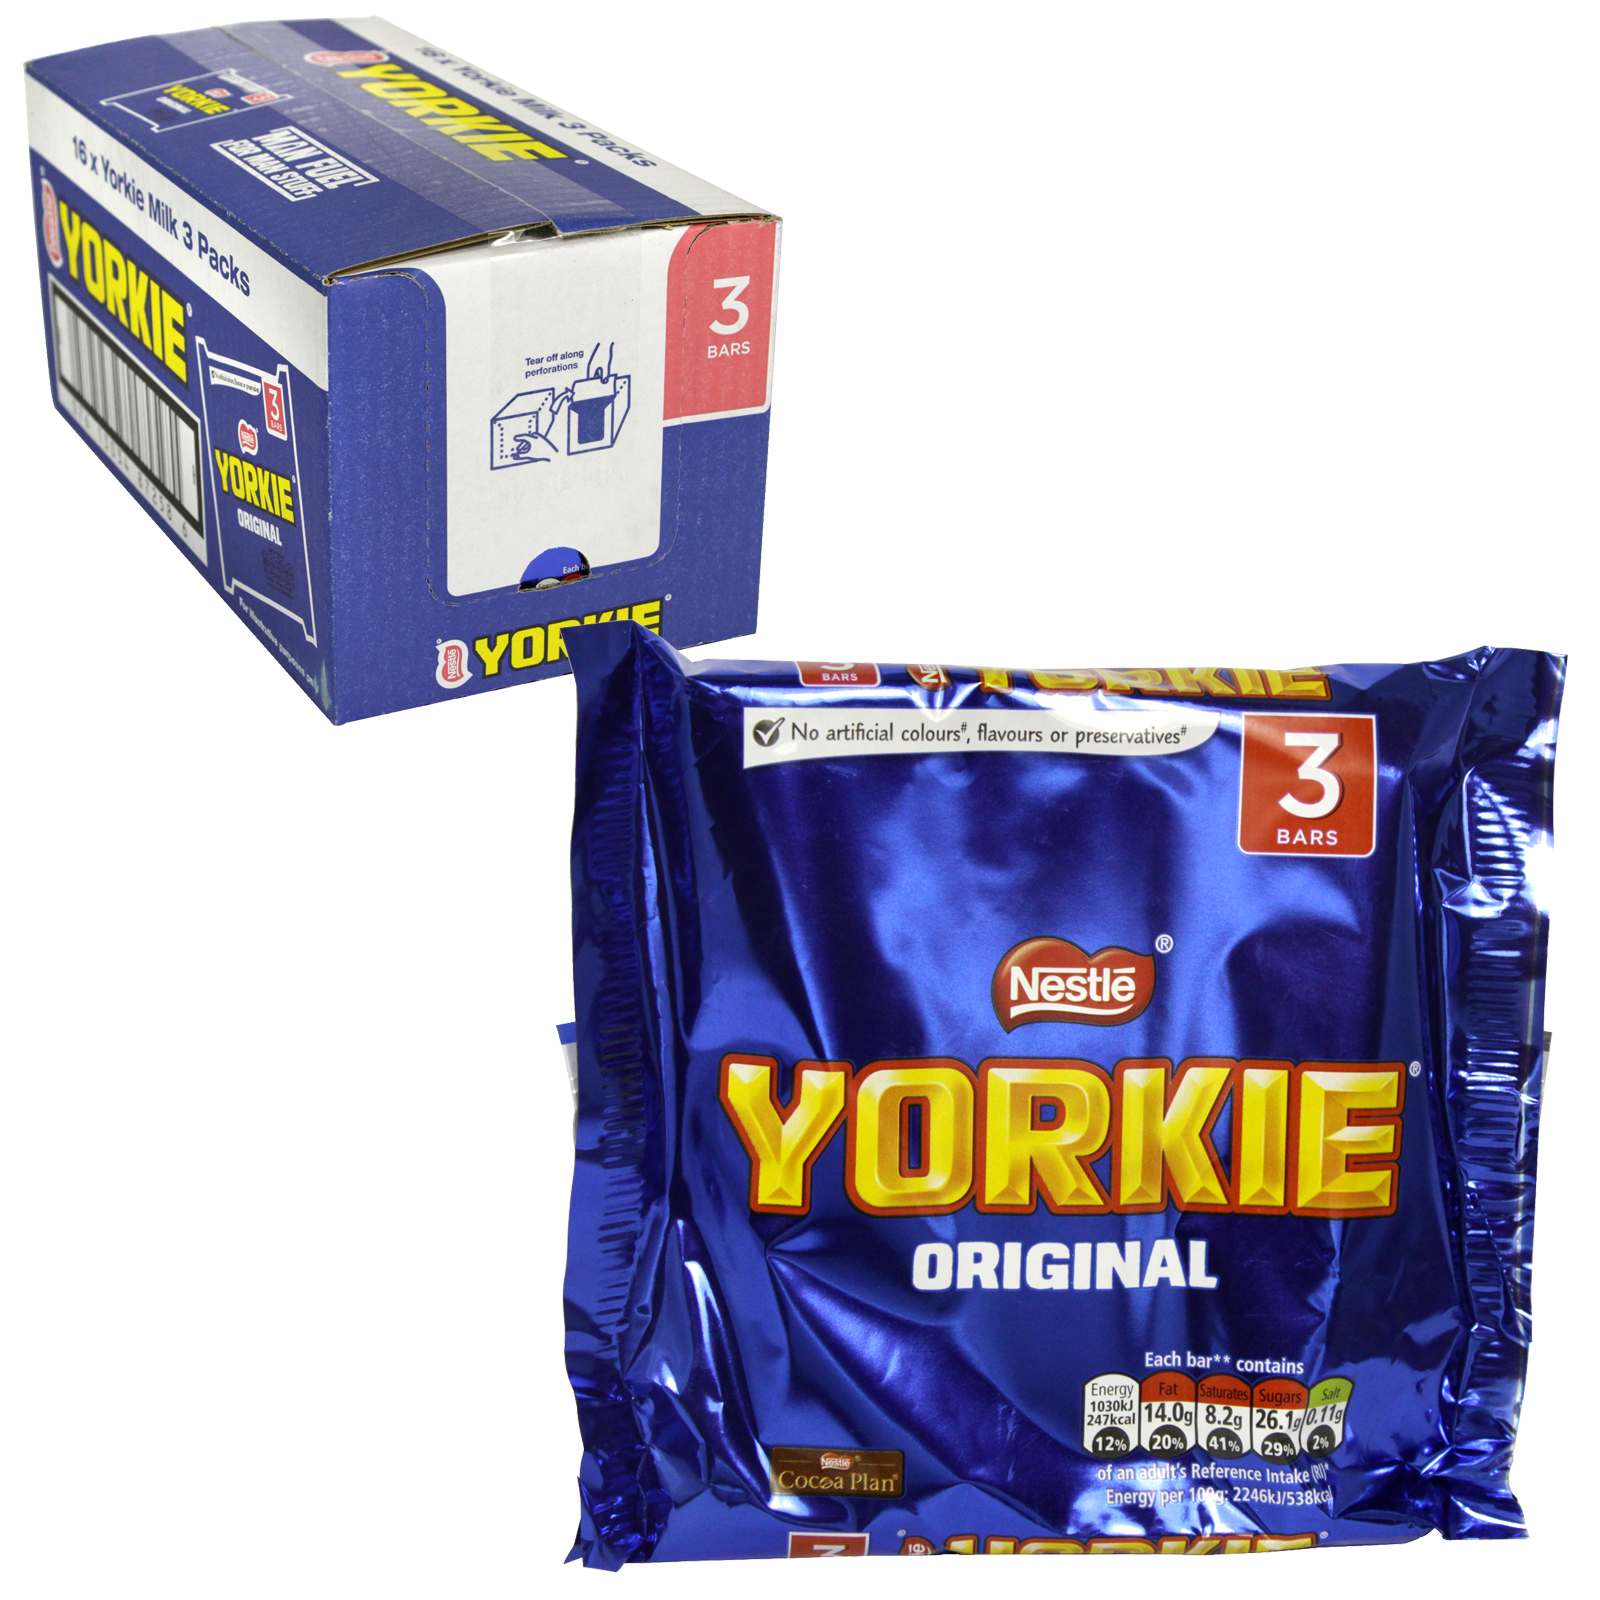 YORKIE ORIGINAL 3 PACK X16